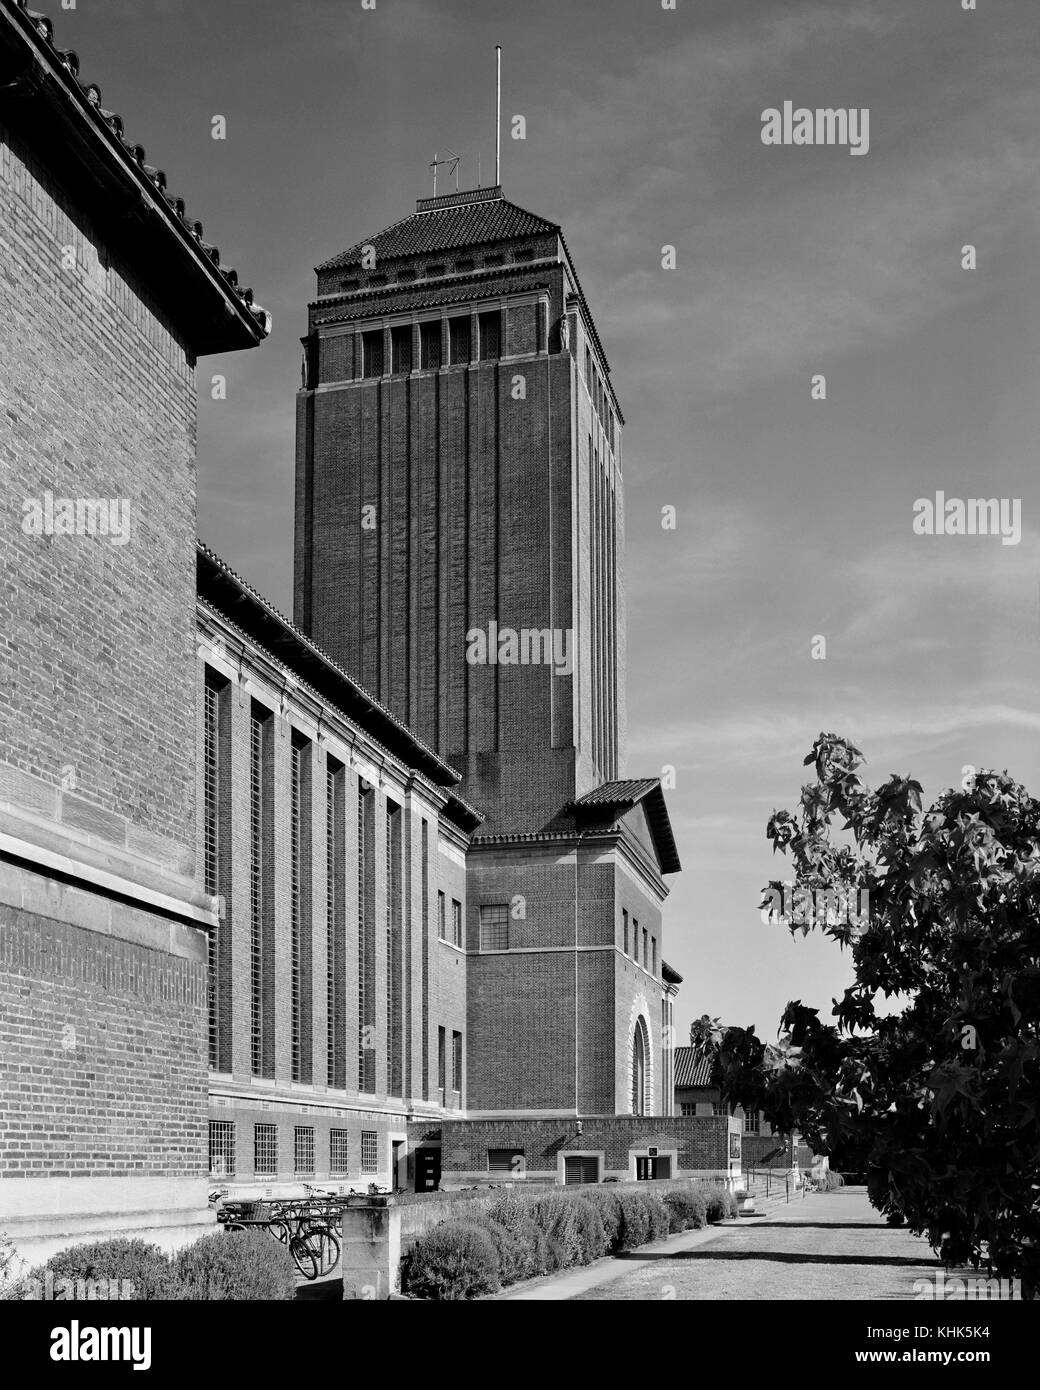 Cambridge University Library - Stock Image